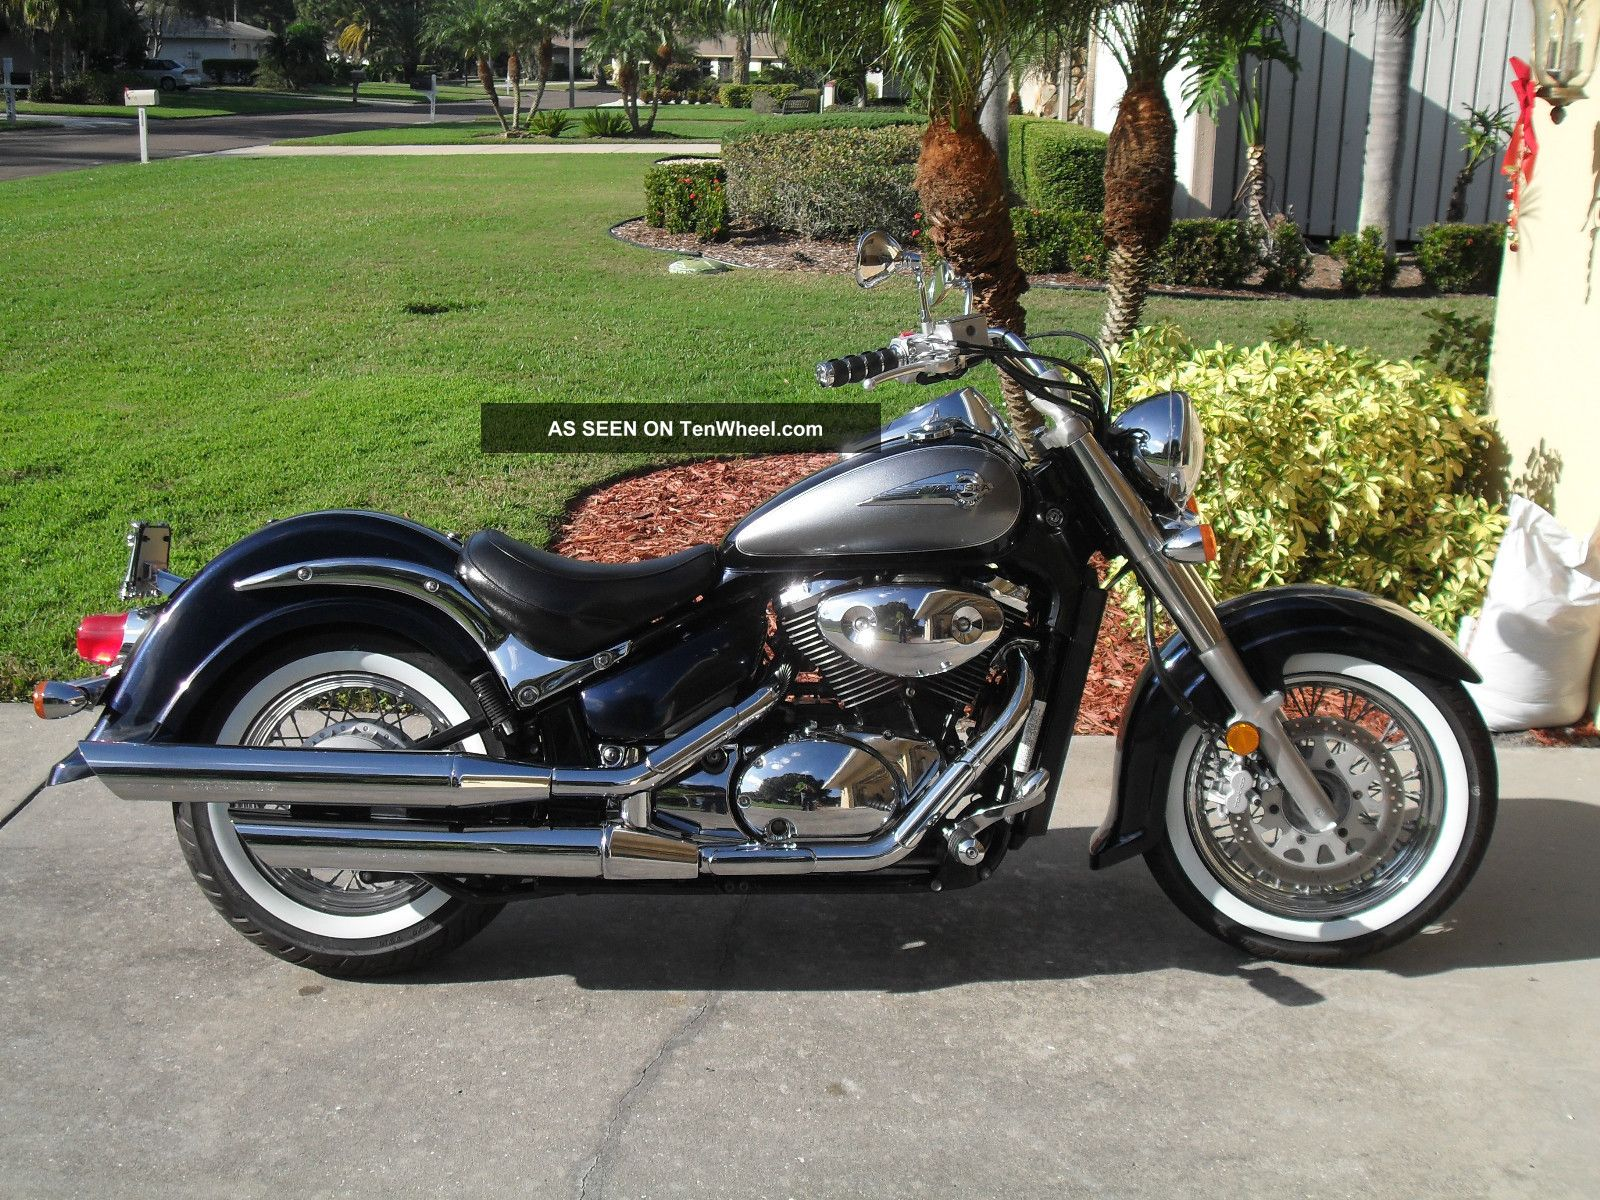 2004 Suzuki 800cc Motorcycle Other photo